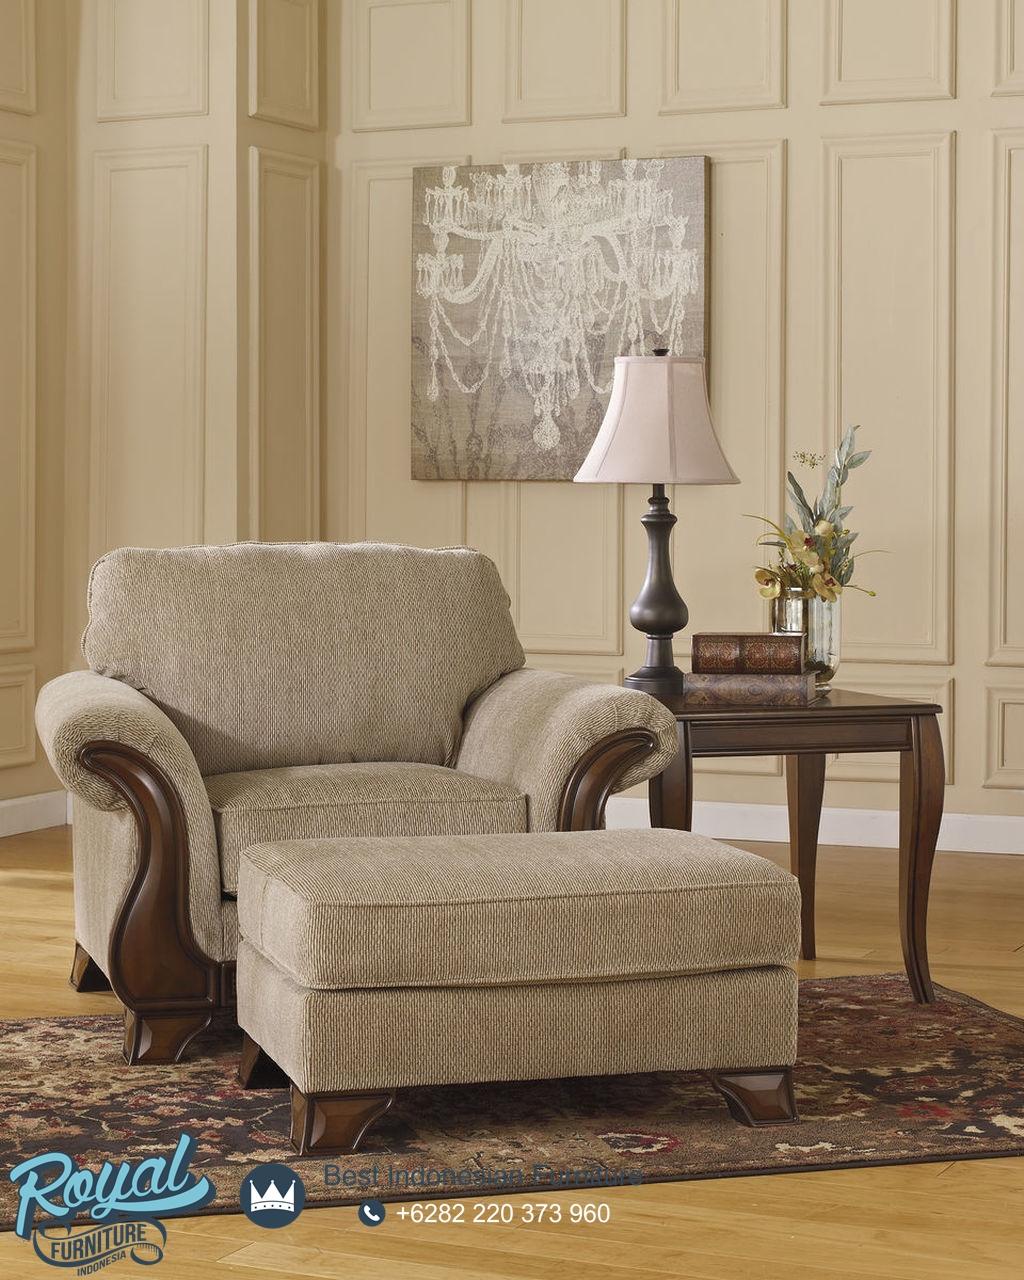 Kursi Tamu Jati Minimalis Klasik Mebel Jepara Antique, sofa jati ukir, sofa kayu jati minimalis, sofa jati jepara minimalis, sofa jati modern, sofa jati mewah, sofa kayu minimalis modern, sofa minimalis, sofa tamu jepara terbaru 2020, sofa tamu klasik, sofa tamu mewah klasik, kursi tamu jati minimalis, kursi tamu ukir jepara, jual sofa tamu jati ukir jepara, model sofa tamu mewah terbaru, desain sofa ruang tamu minimalis, sofa tamu mewah terbaru, sofa mewah terbaru, sofa mewah modern, sofa mewah kulit, sofa mewah minimalis terbaru, sofa tamu jepara, sofa ruang tamu mewah modern, sofa ruang tamu mewah minimalis, sofa ruang tamu terbaru, sofa ruang tamu jati, kursi sofa ruang tamu mewah, sofa minimalis terbaru, sofa ruang tamu elegan, mebel jepara, toko furniture jepara, royal furniture